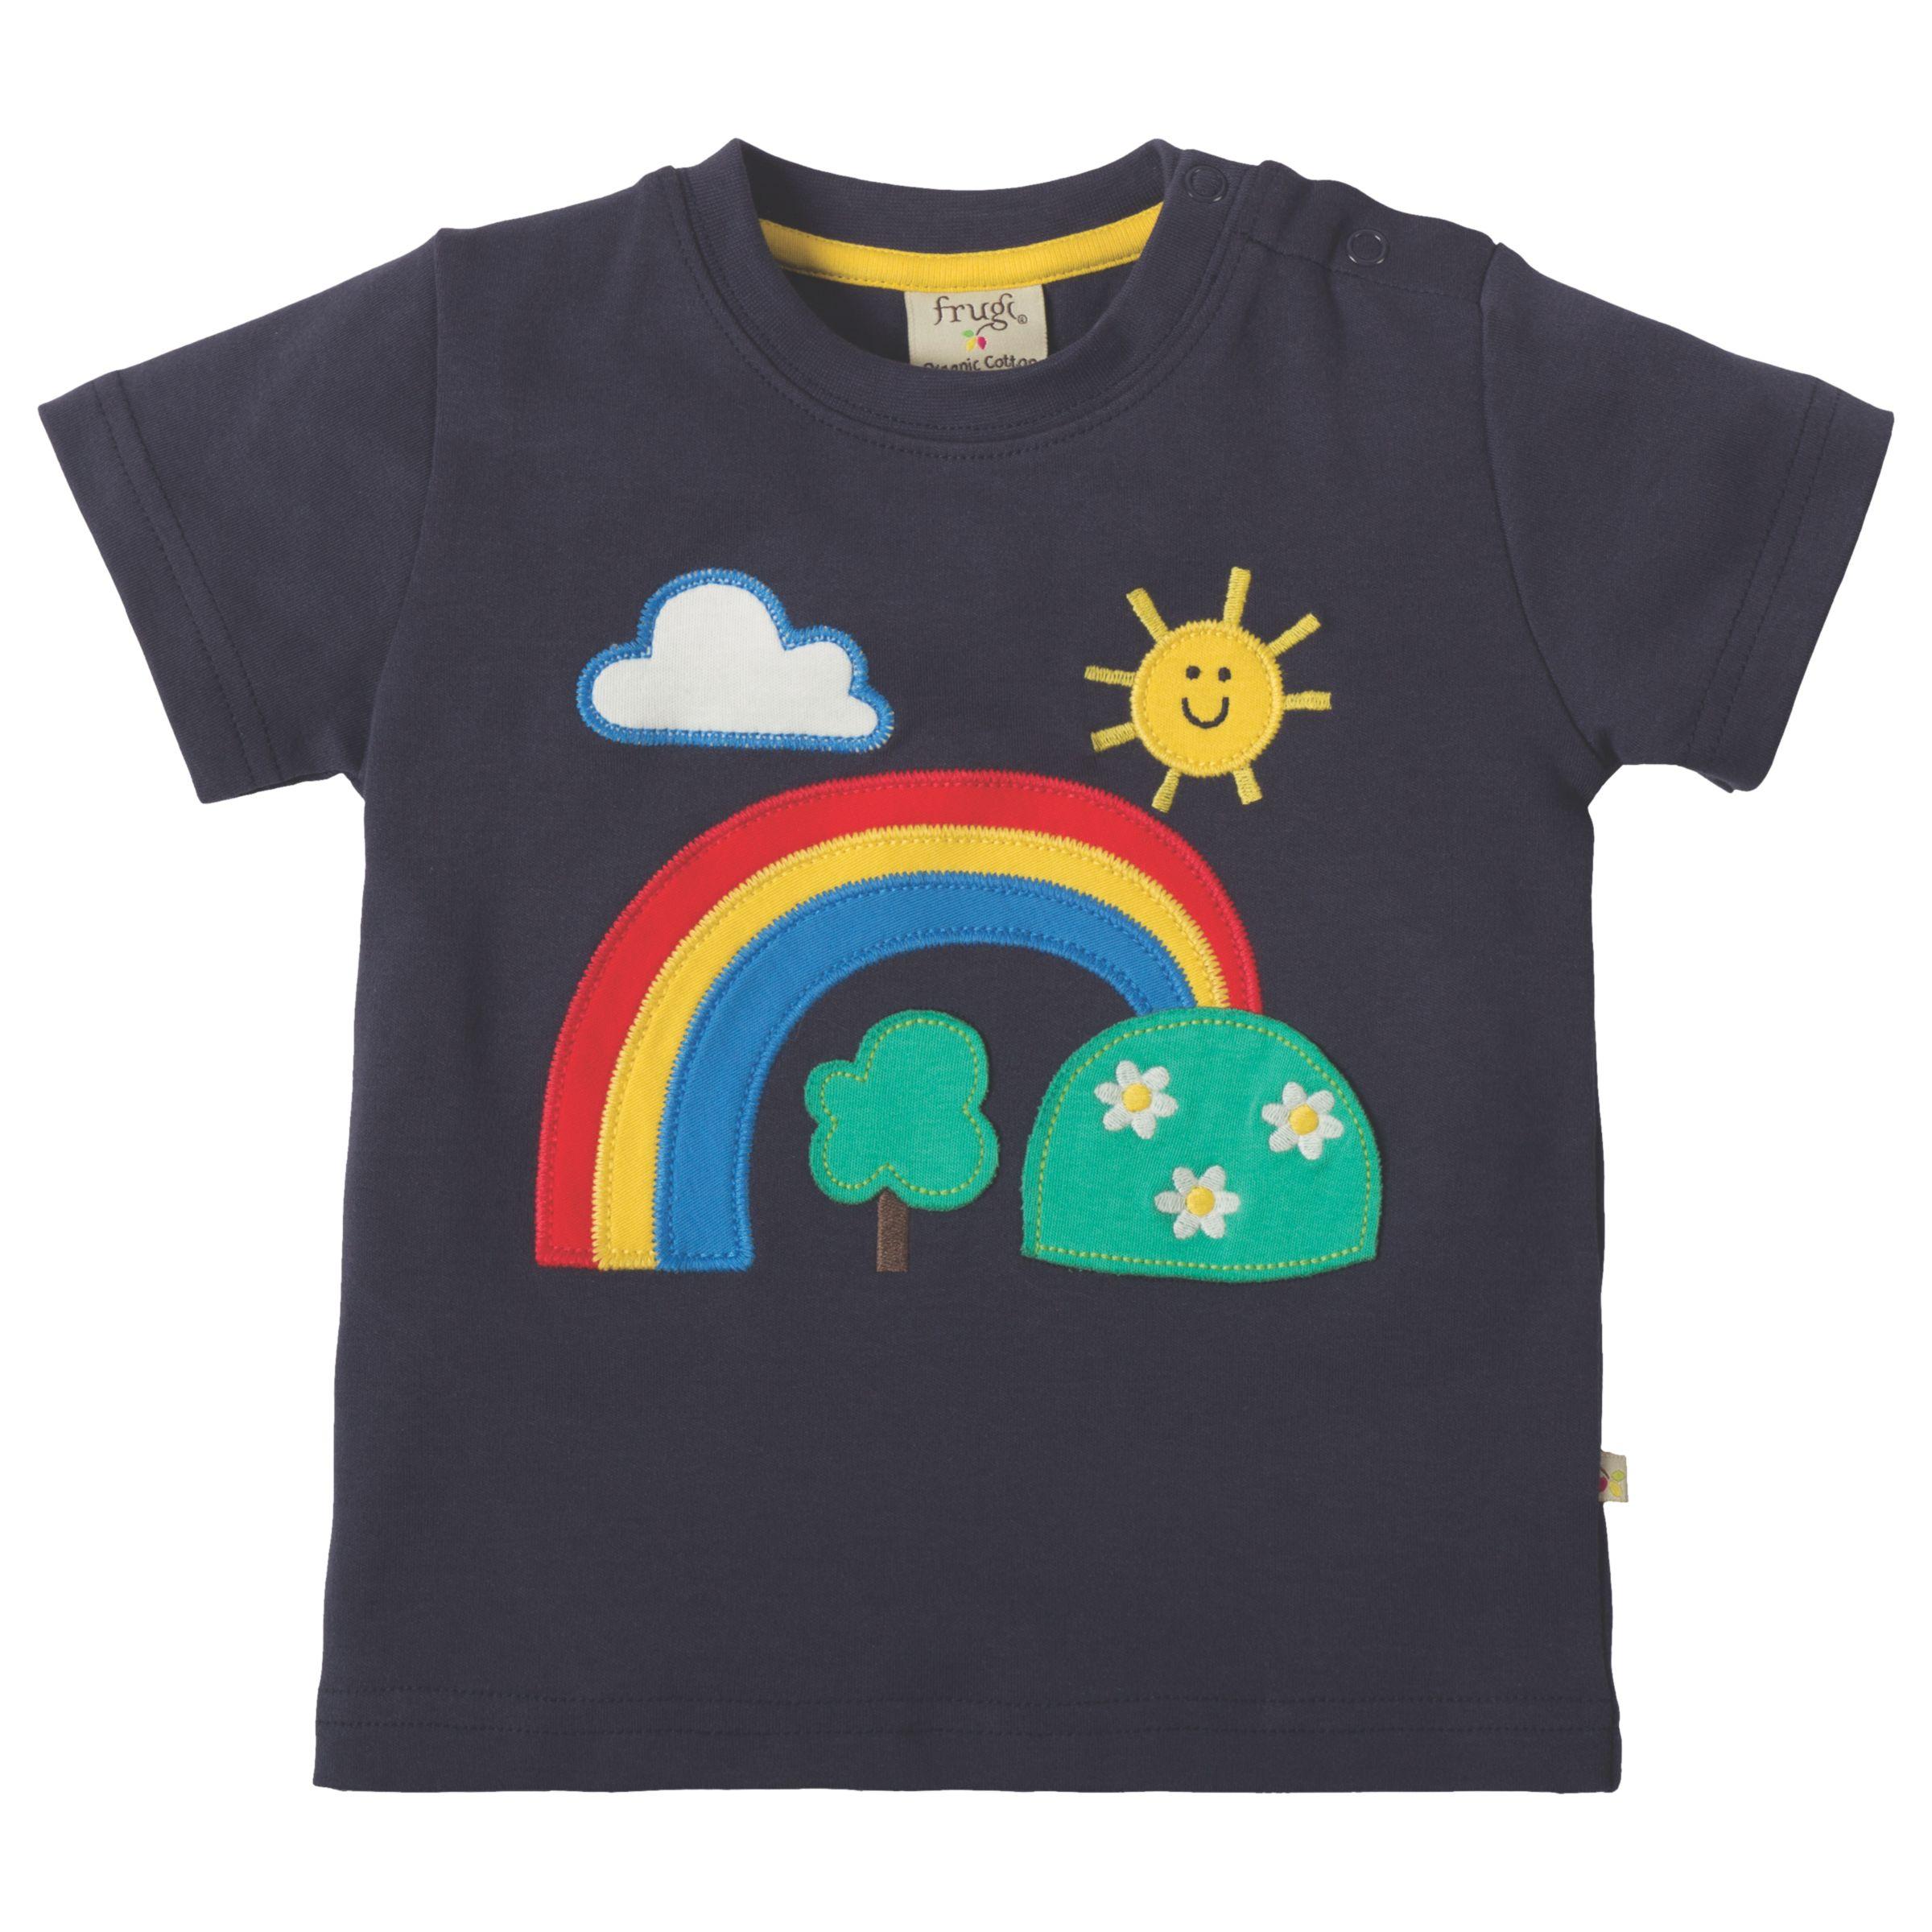 Frugi Organic Frugi Organic Baby Little Creature Rainbow Applique Short Sleeve Top, Navy